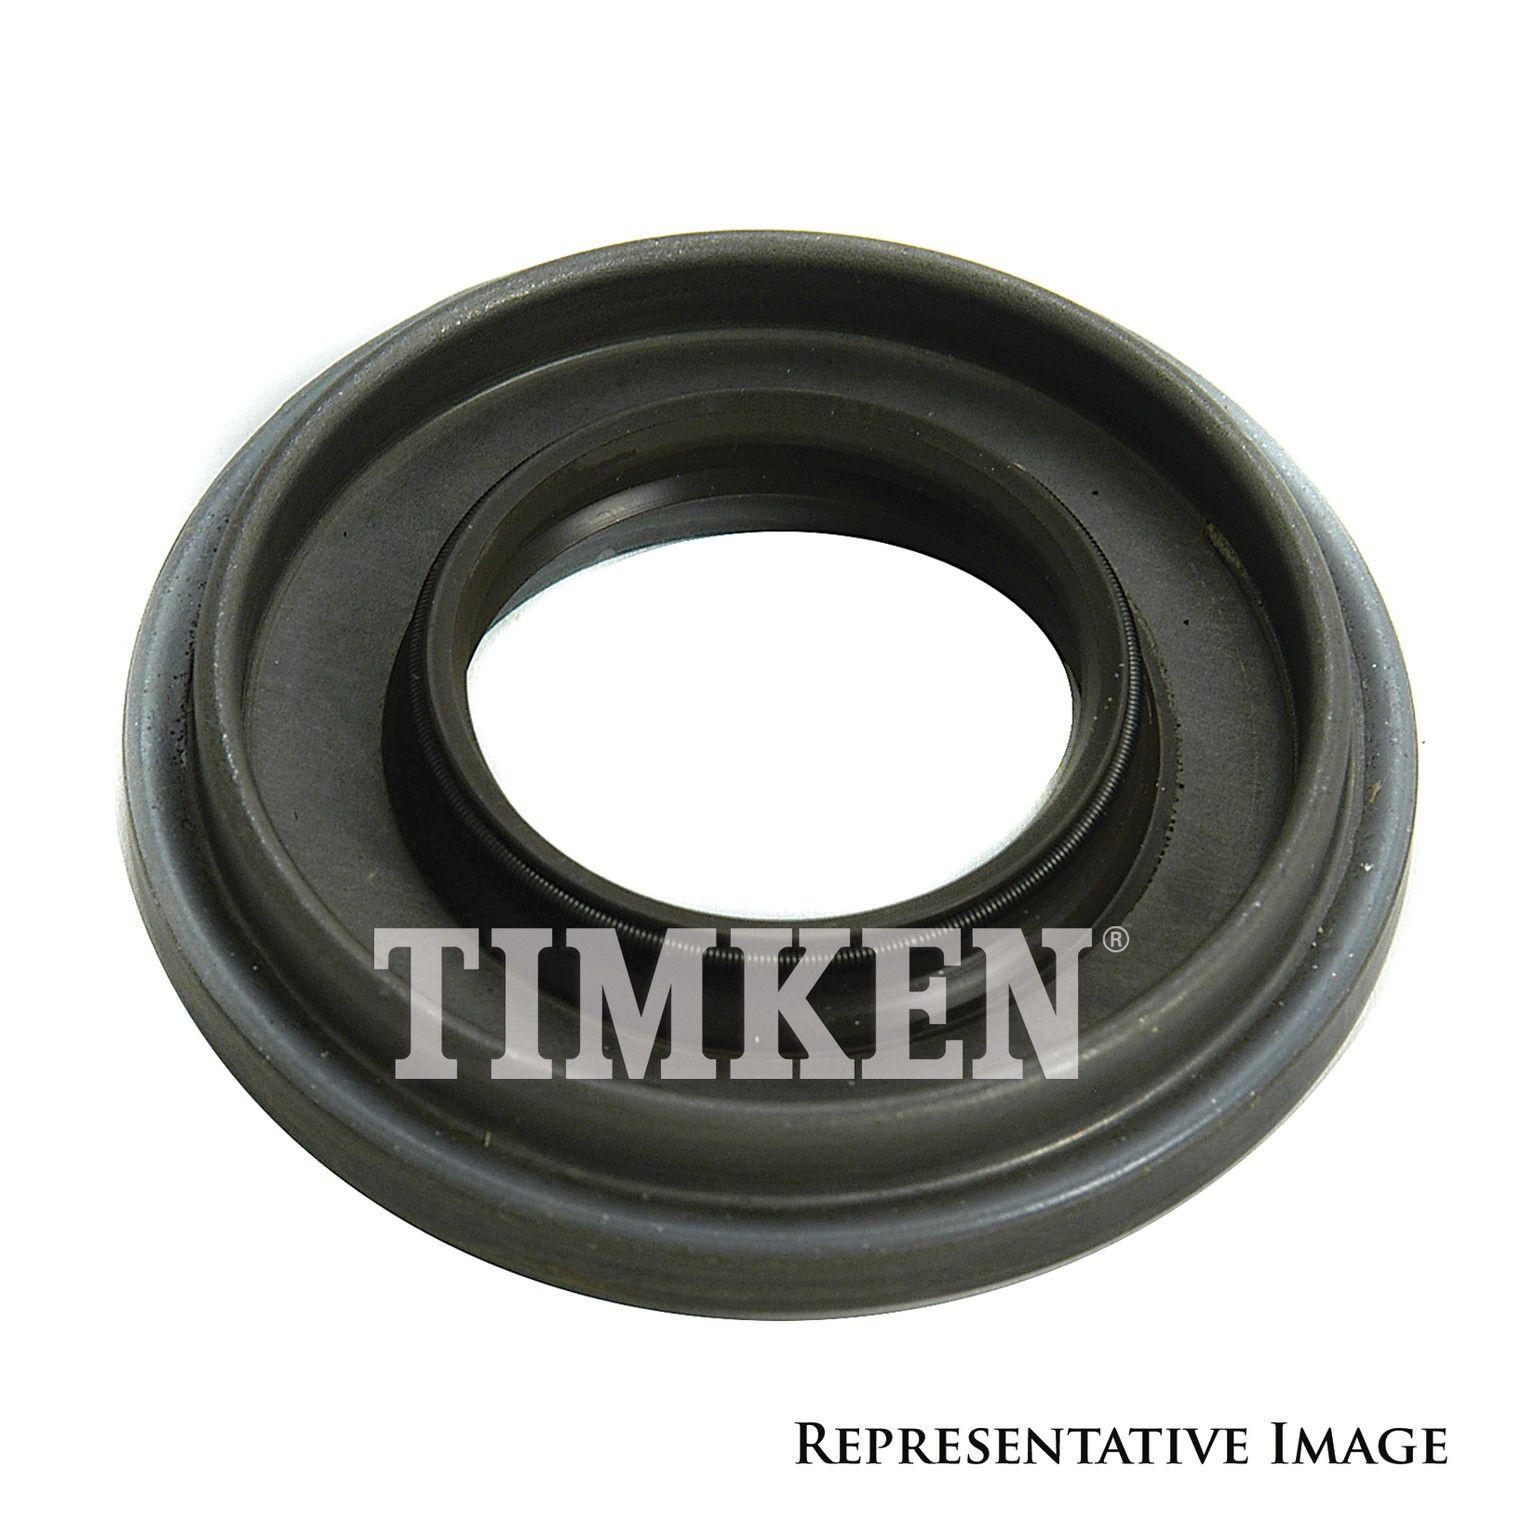 YMS47761 Replacement Pinion Seal for Dana 50 Differential Yukon Gear Yukon